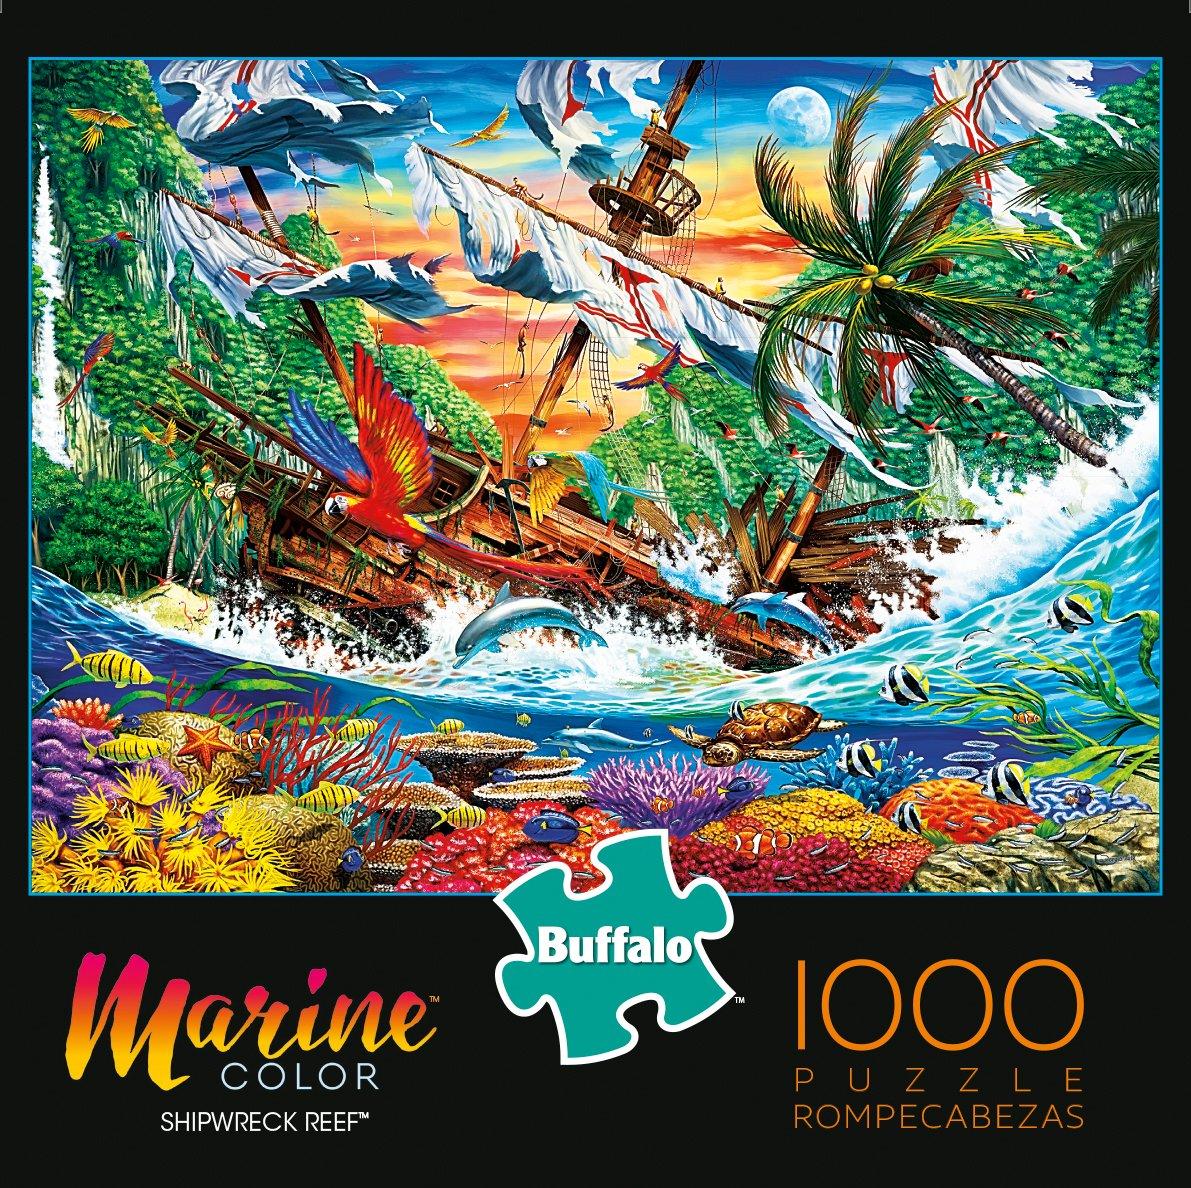 Buffalo Games - Marine Color - Shipwreck Reef - 1000 Piece Jigsaw Puzzle by Buffalo Games (Image #2)